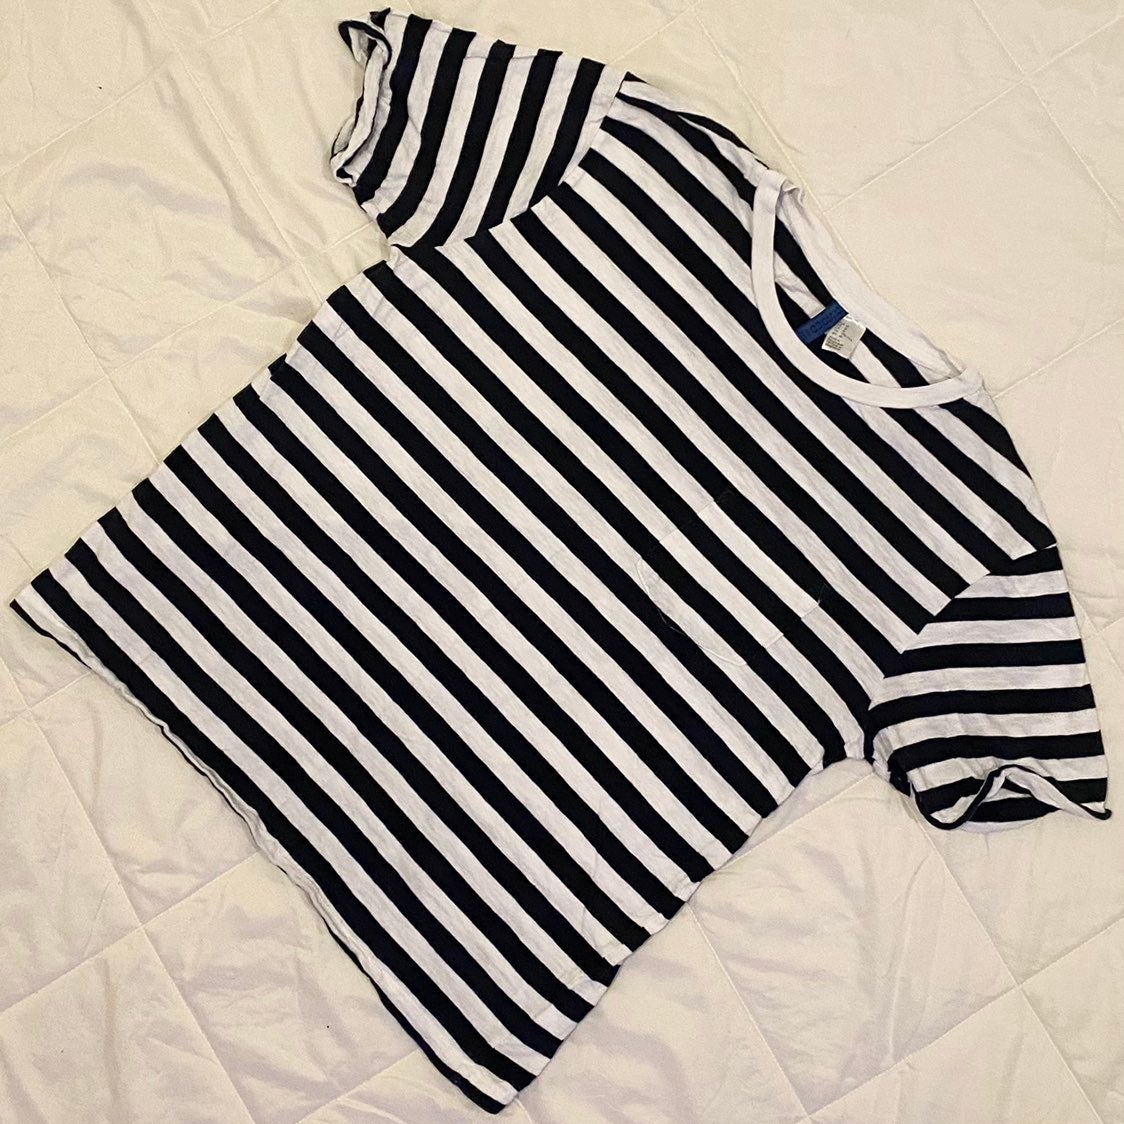 Striped Black & White Casual T-Shirt